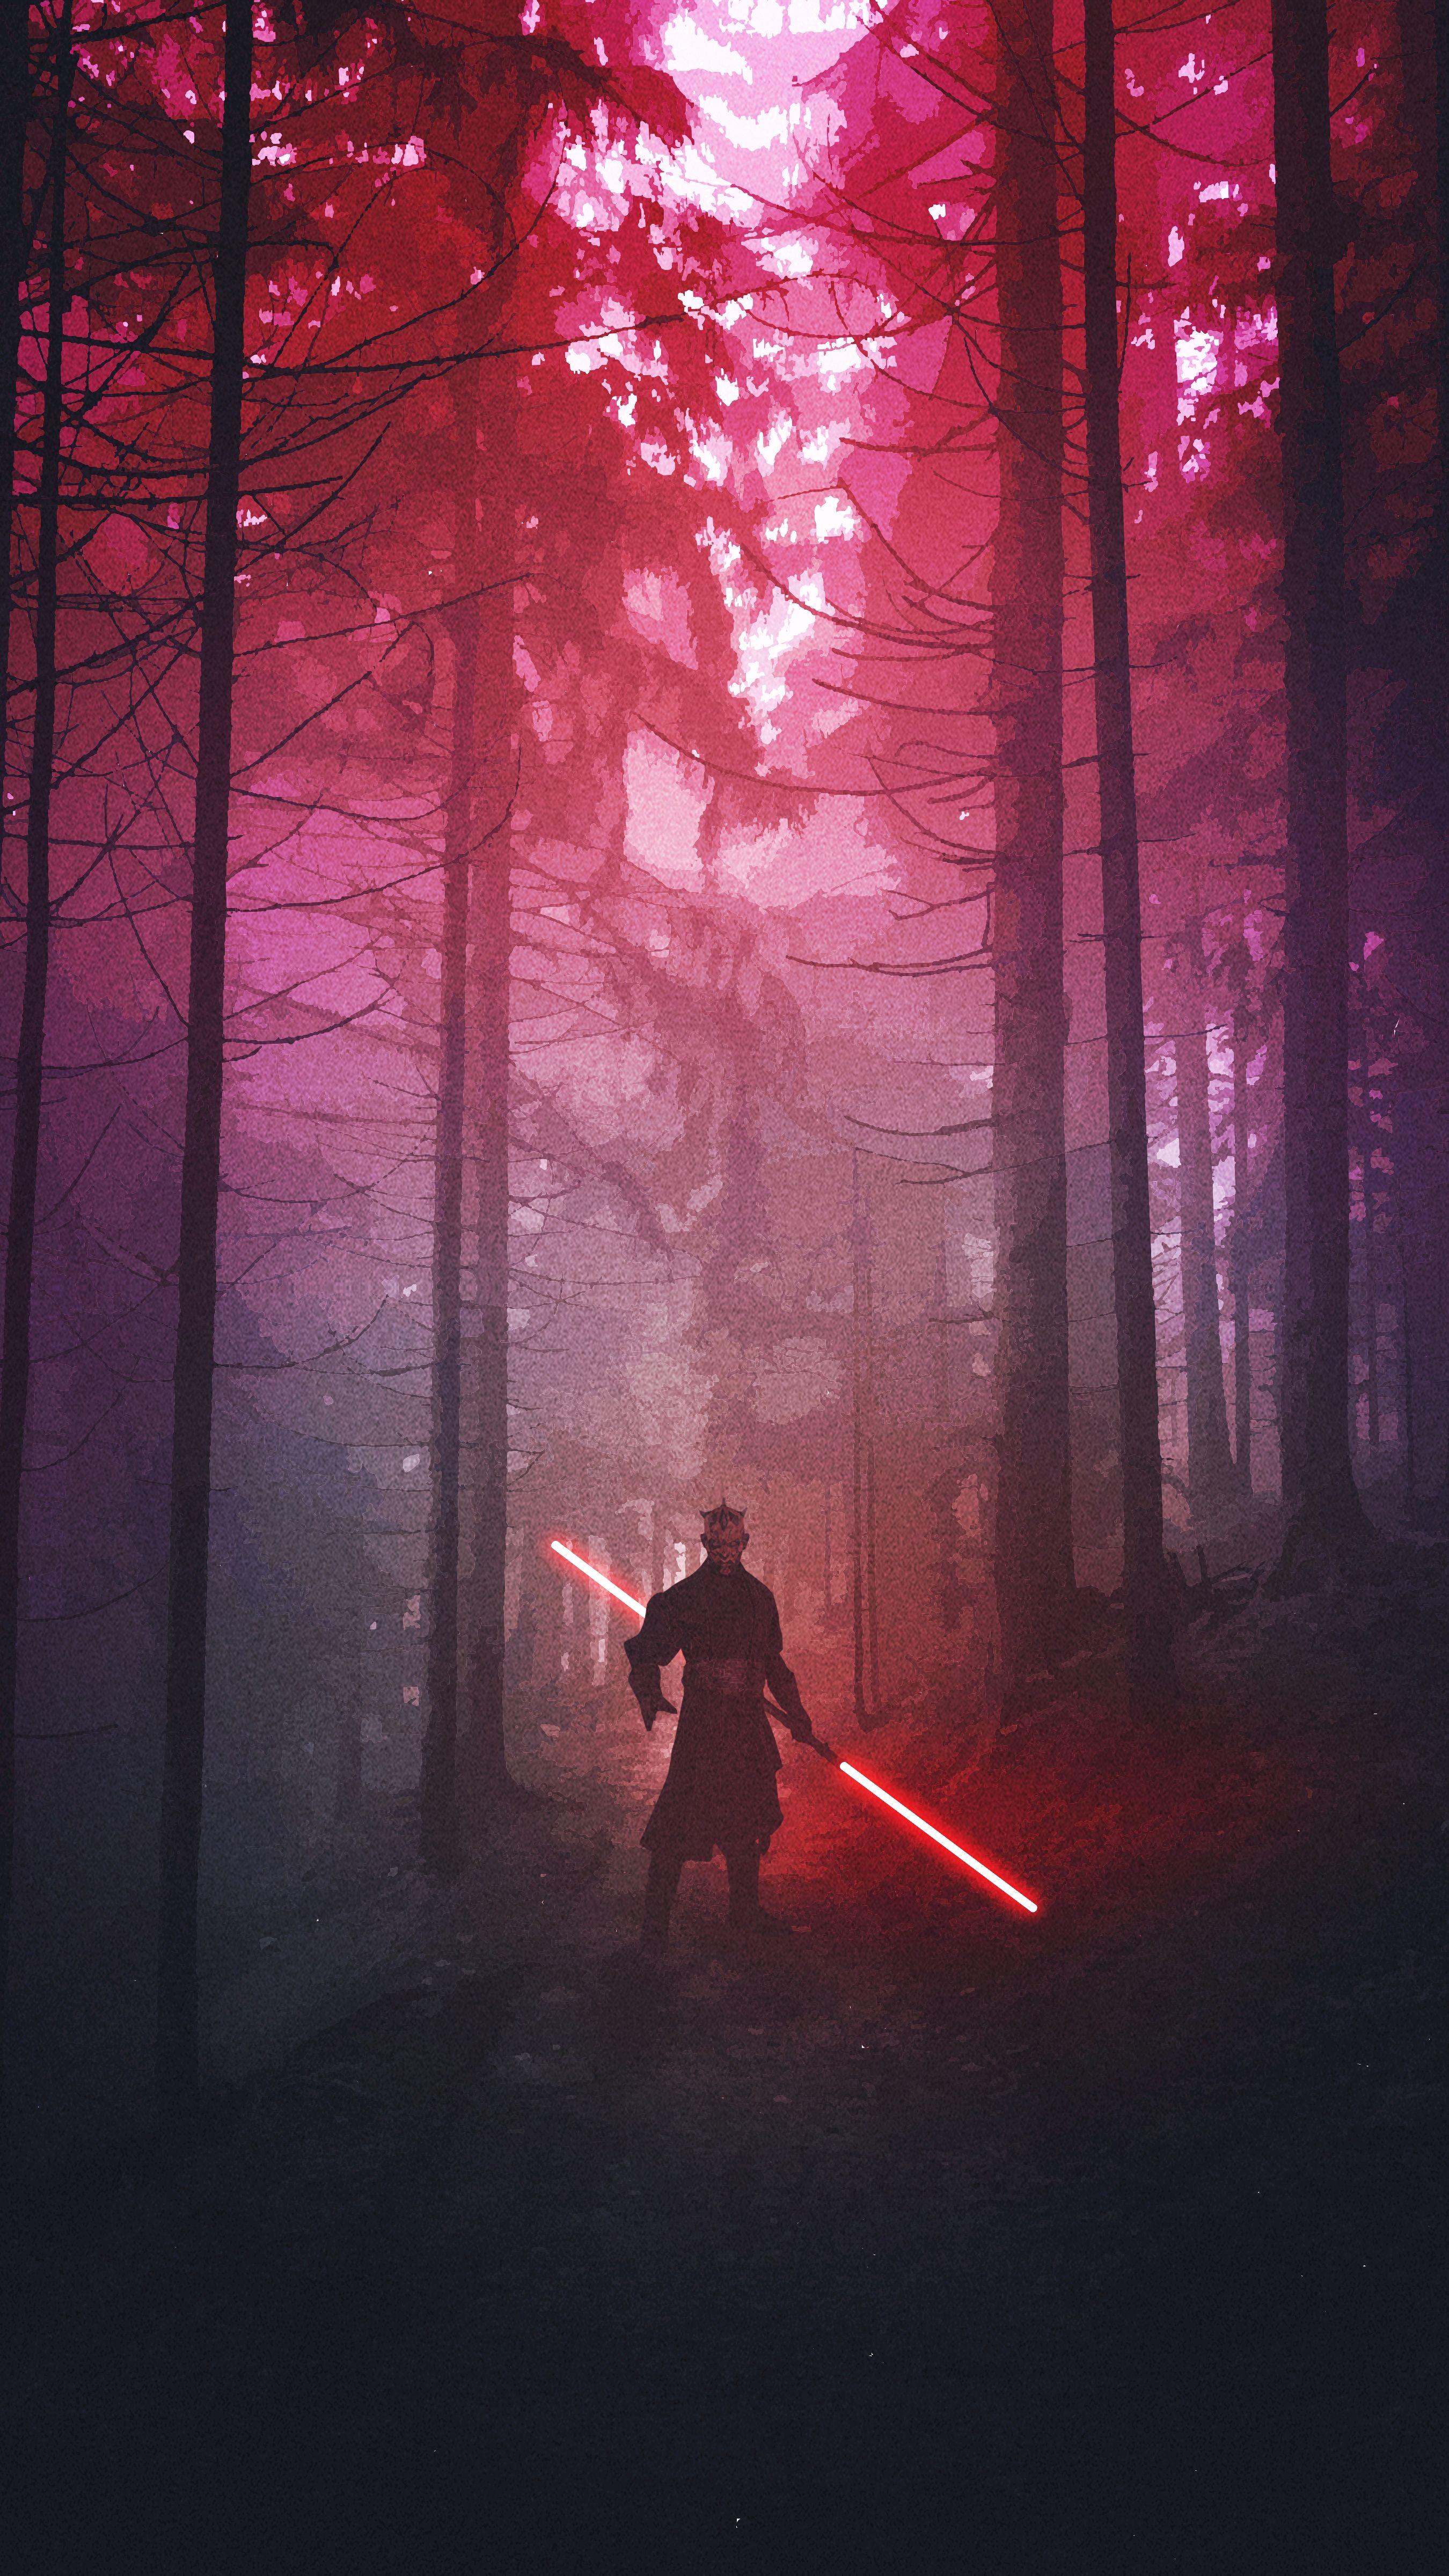 Modern Day Wallpaper Forest Star Wars Furnishings